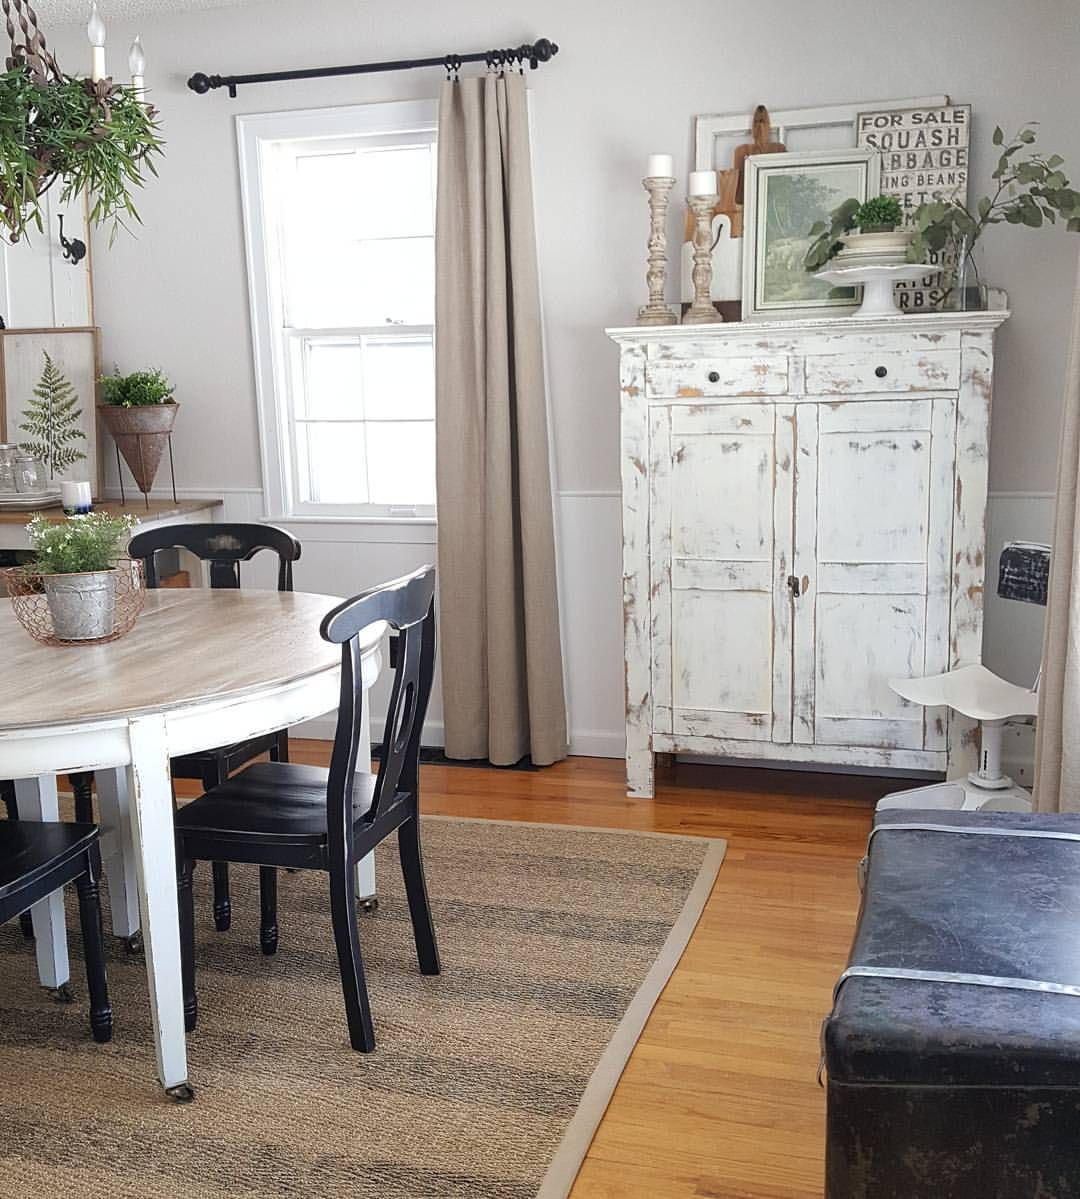 15 Incredible Shabby Chic Kitchen Interior Designs You Can ... |Farmhouse Decor Shabby Organization